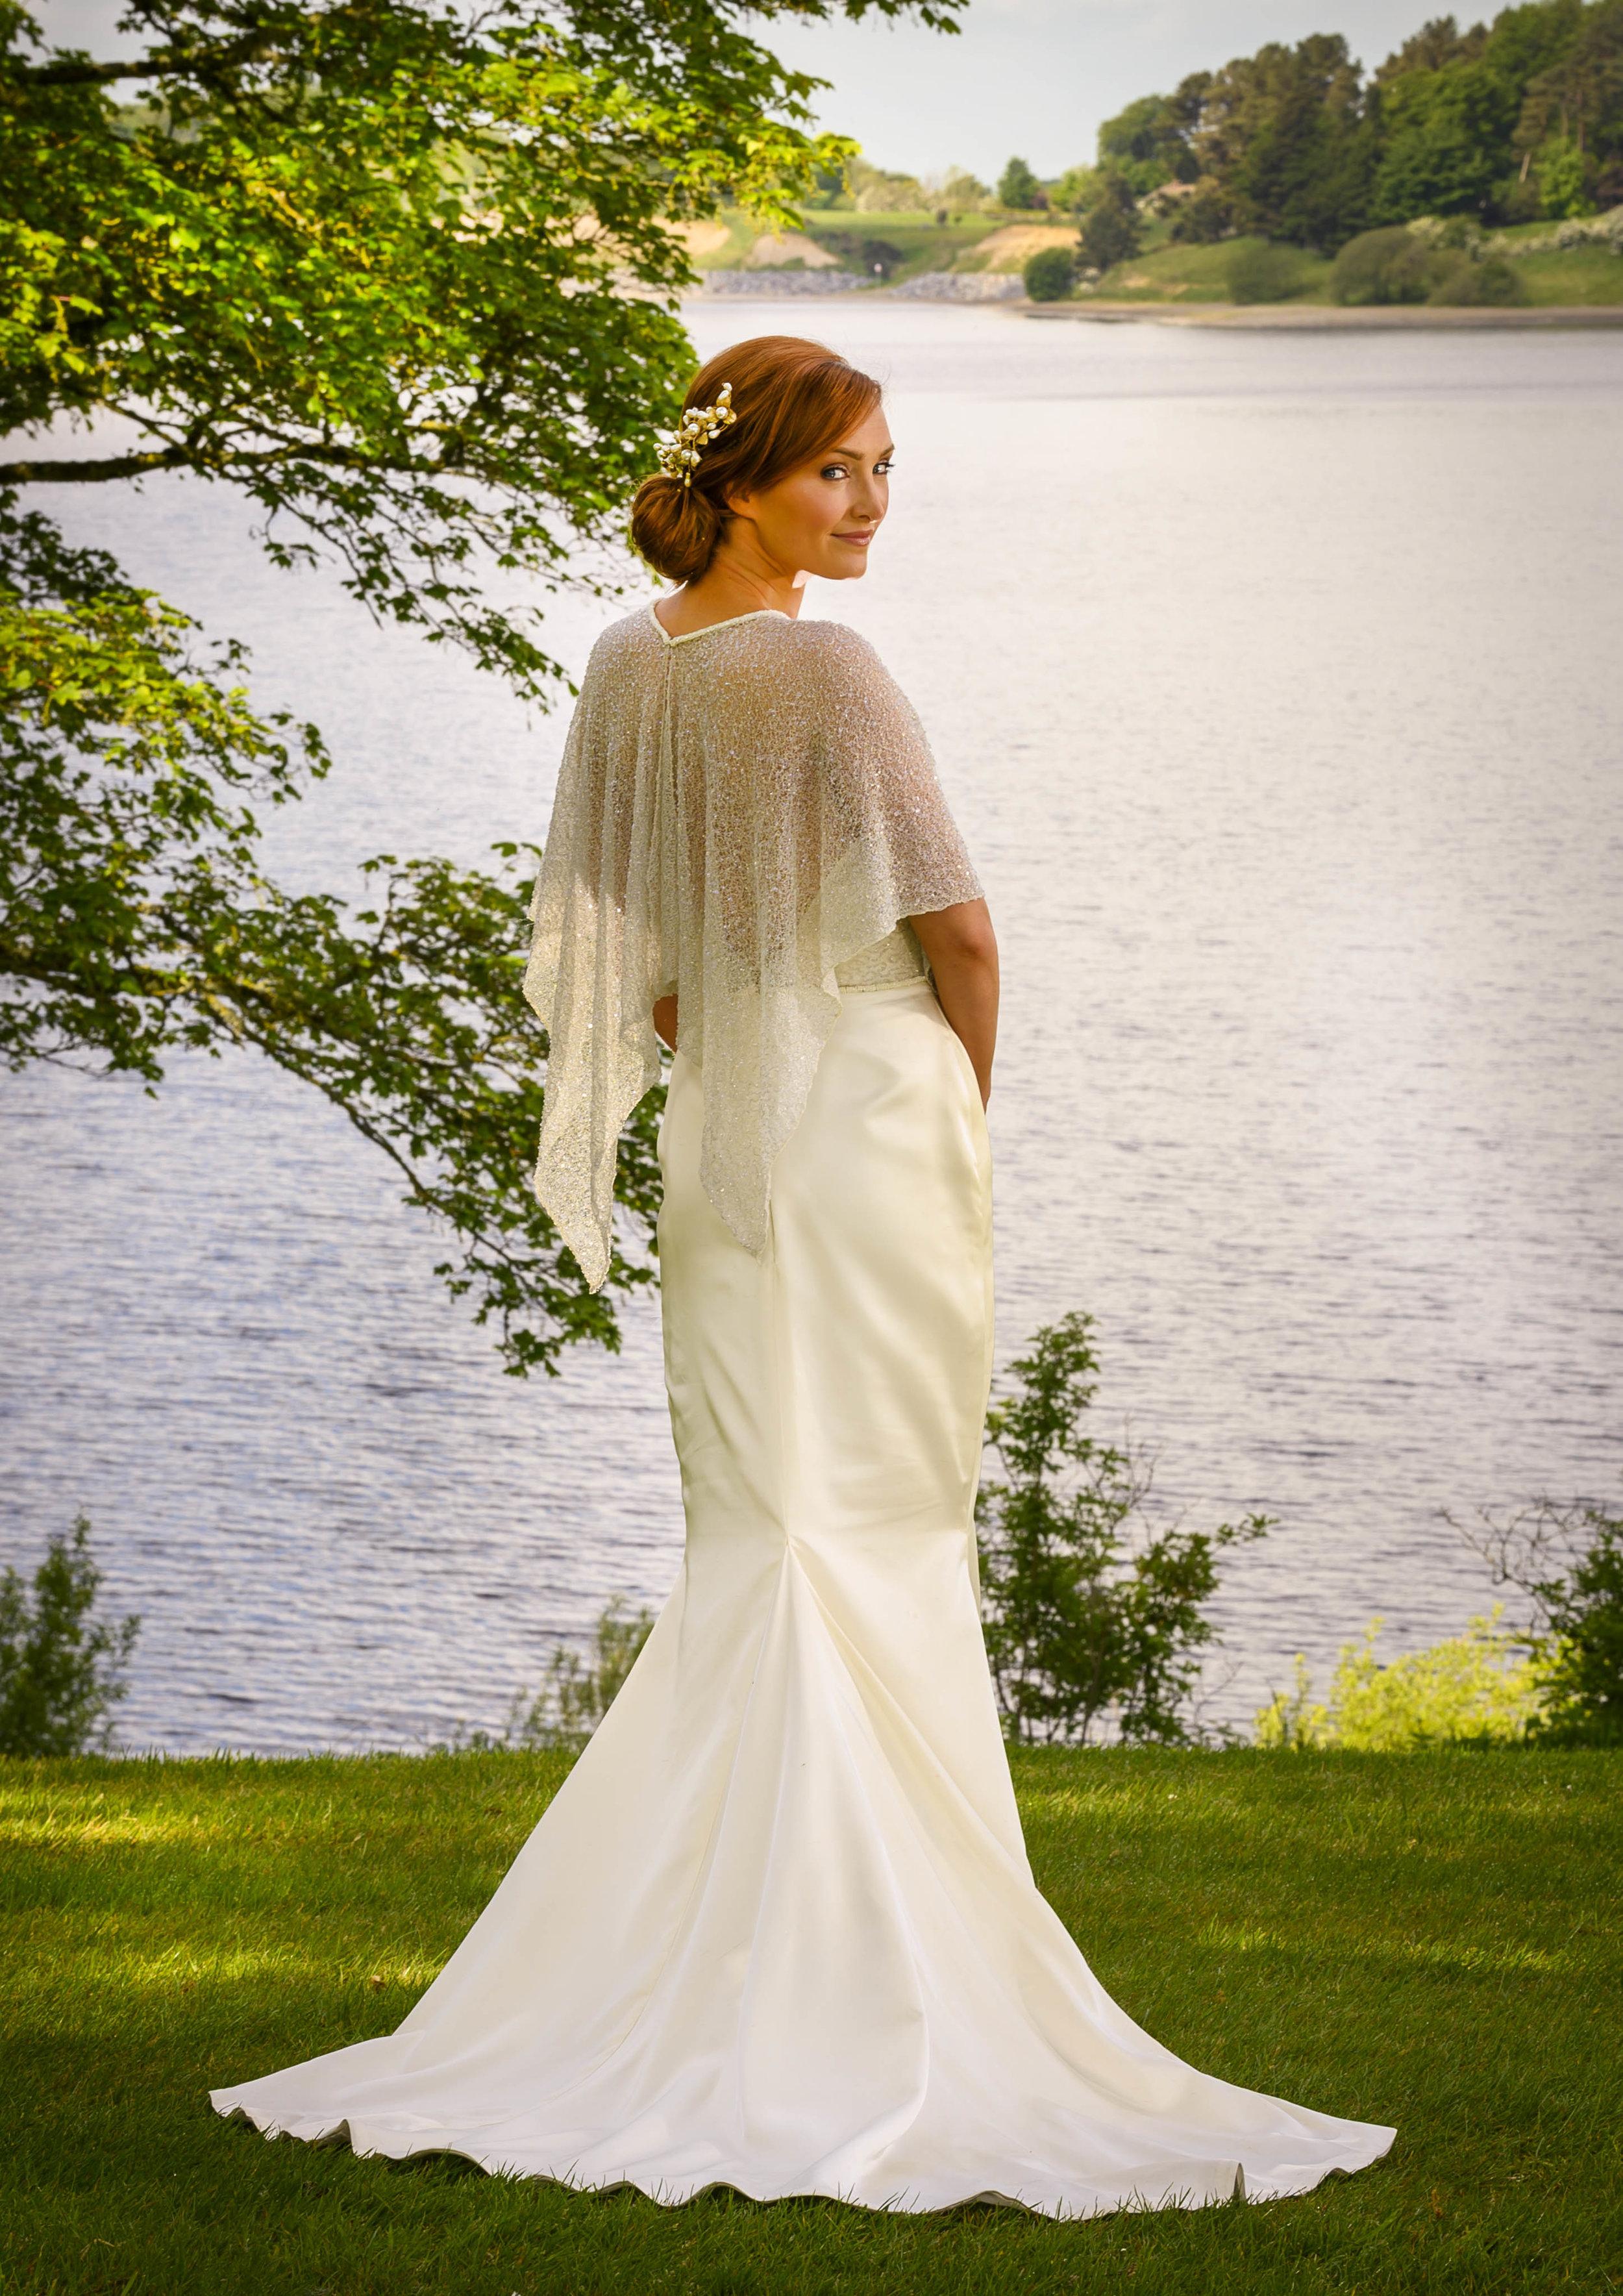 Irish Wedding Diary Tulfarris Photoshoot 14.jpg